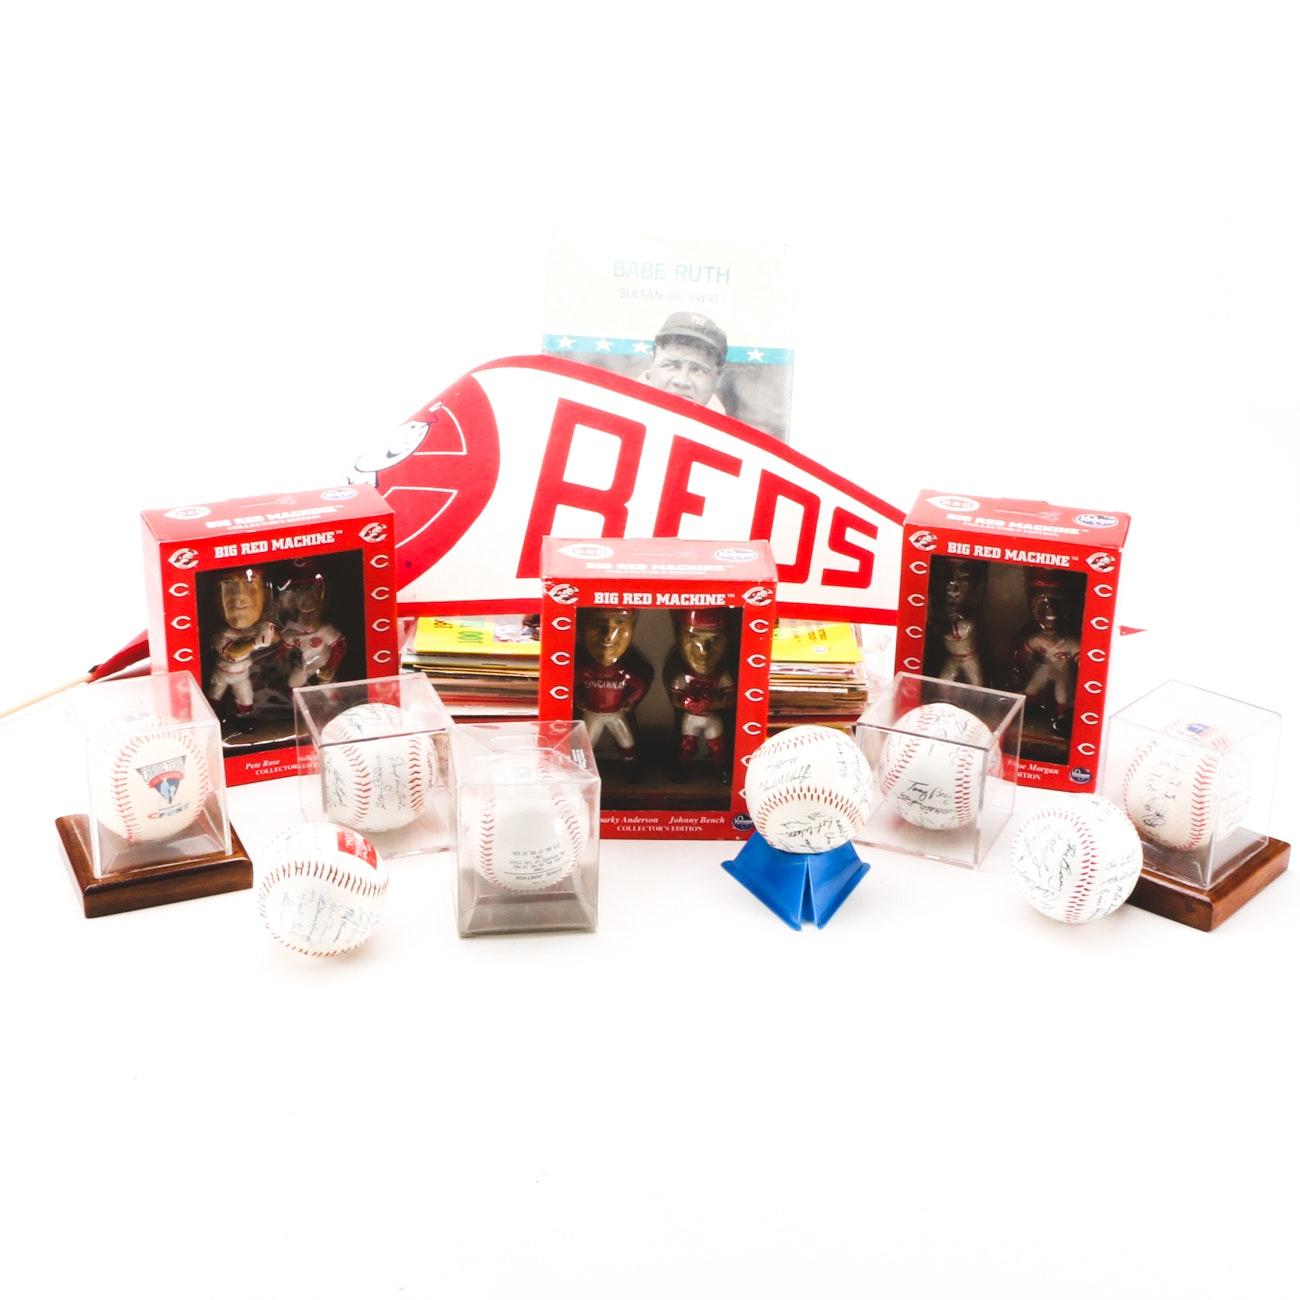 Assorted Baseball Memorabilia Including Bobblehead Dolls